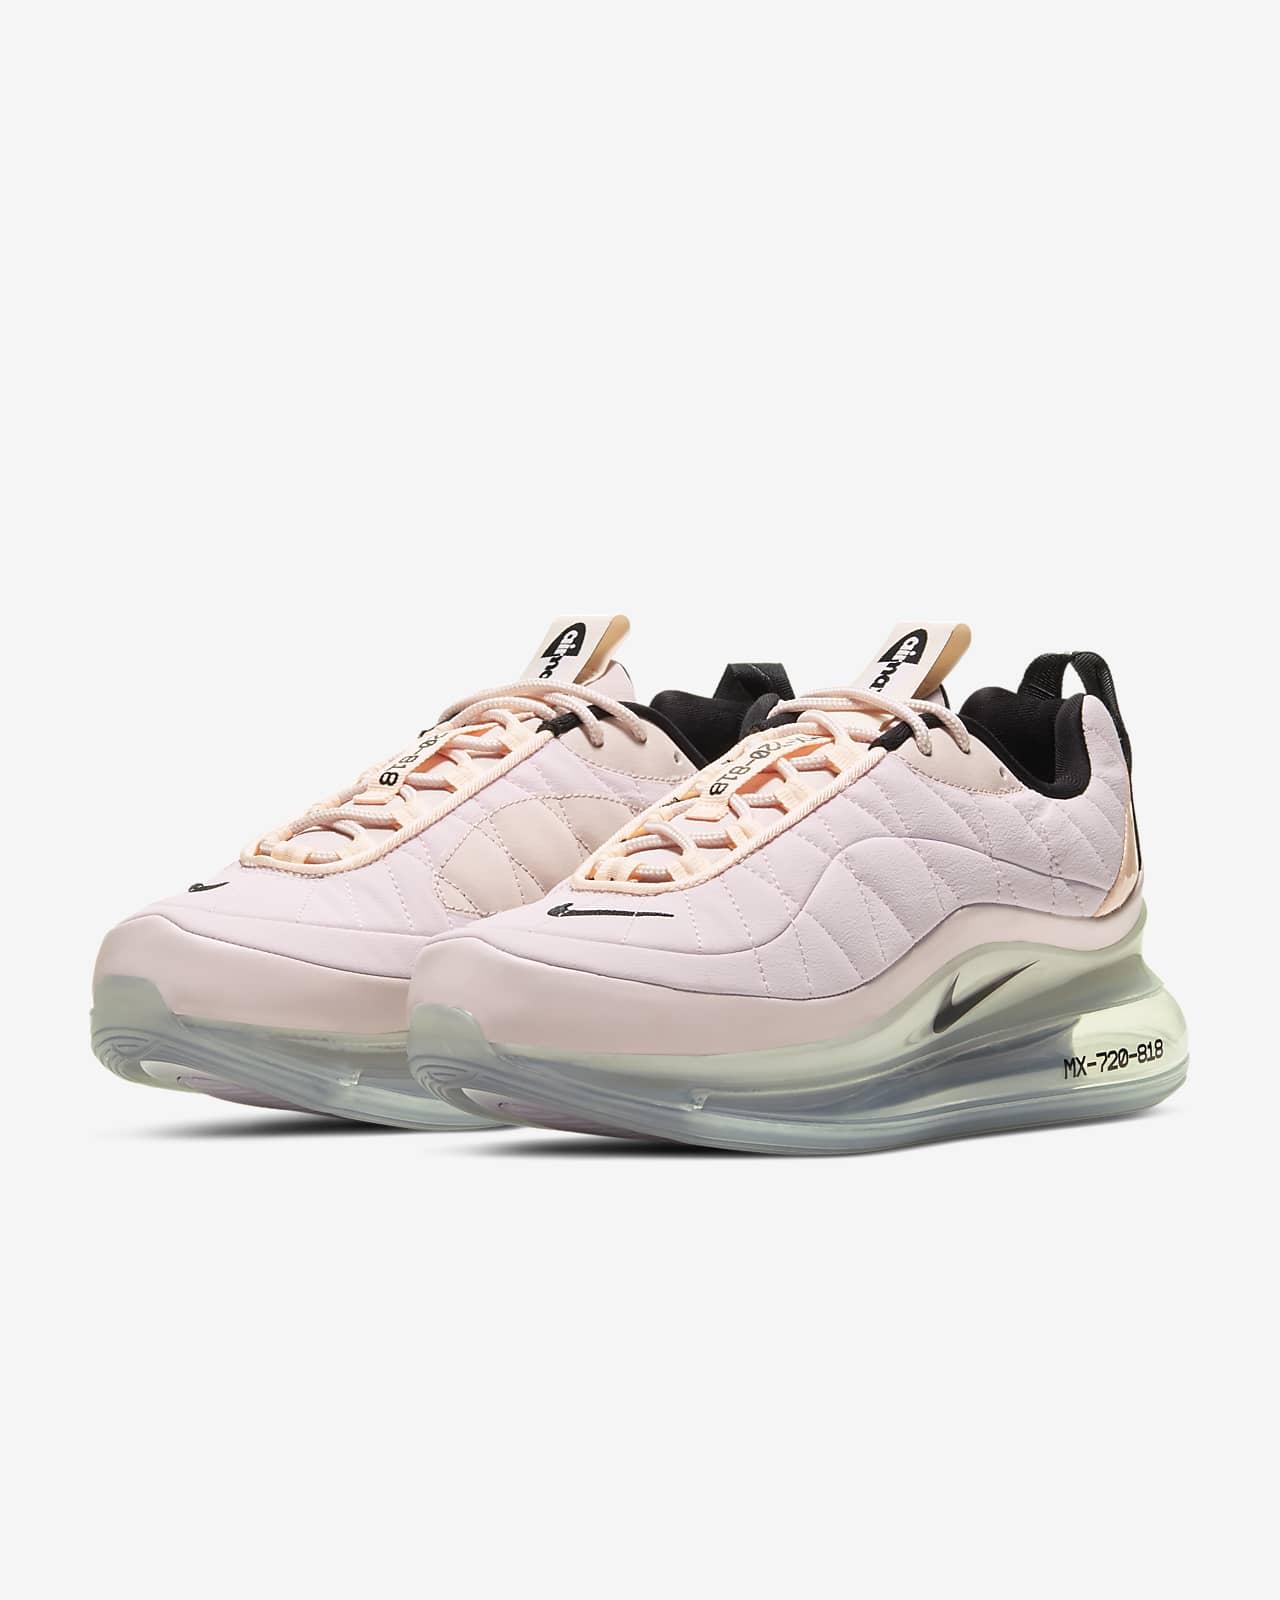 Chaussure Nike MX 720-818 pour Femme